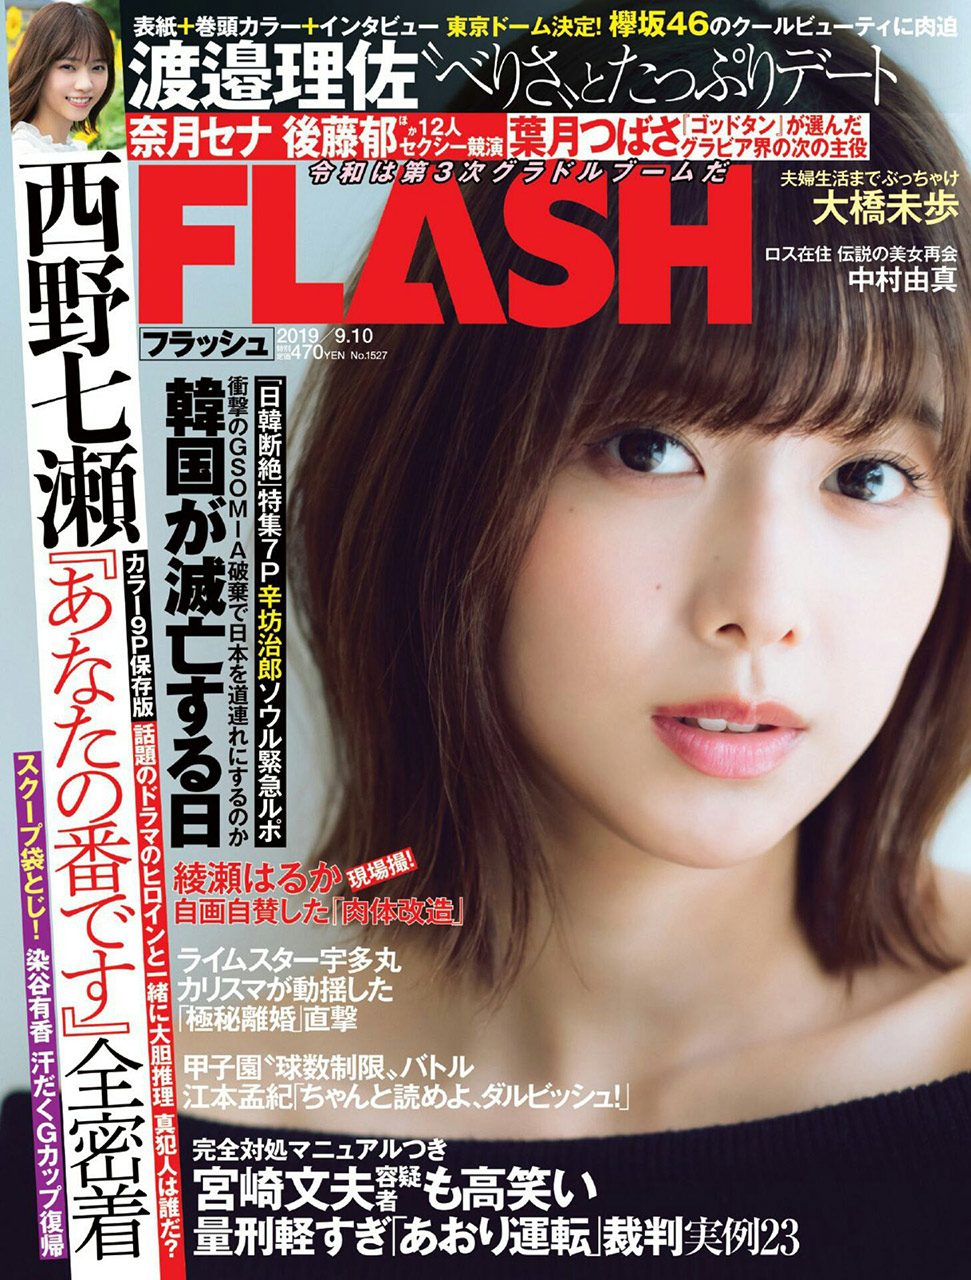 FLASH(フラッシュ) No.1527 2019年9月10日号